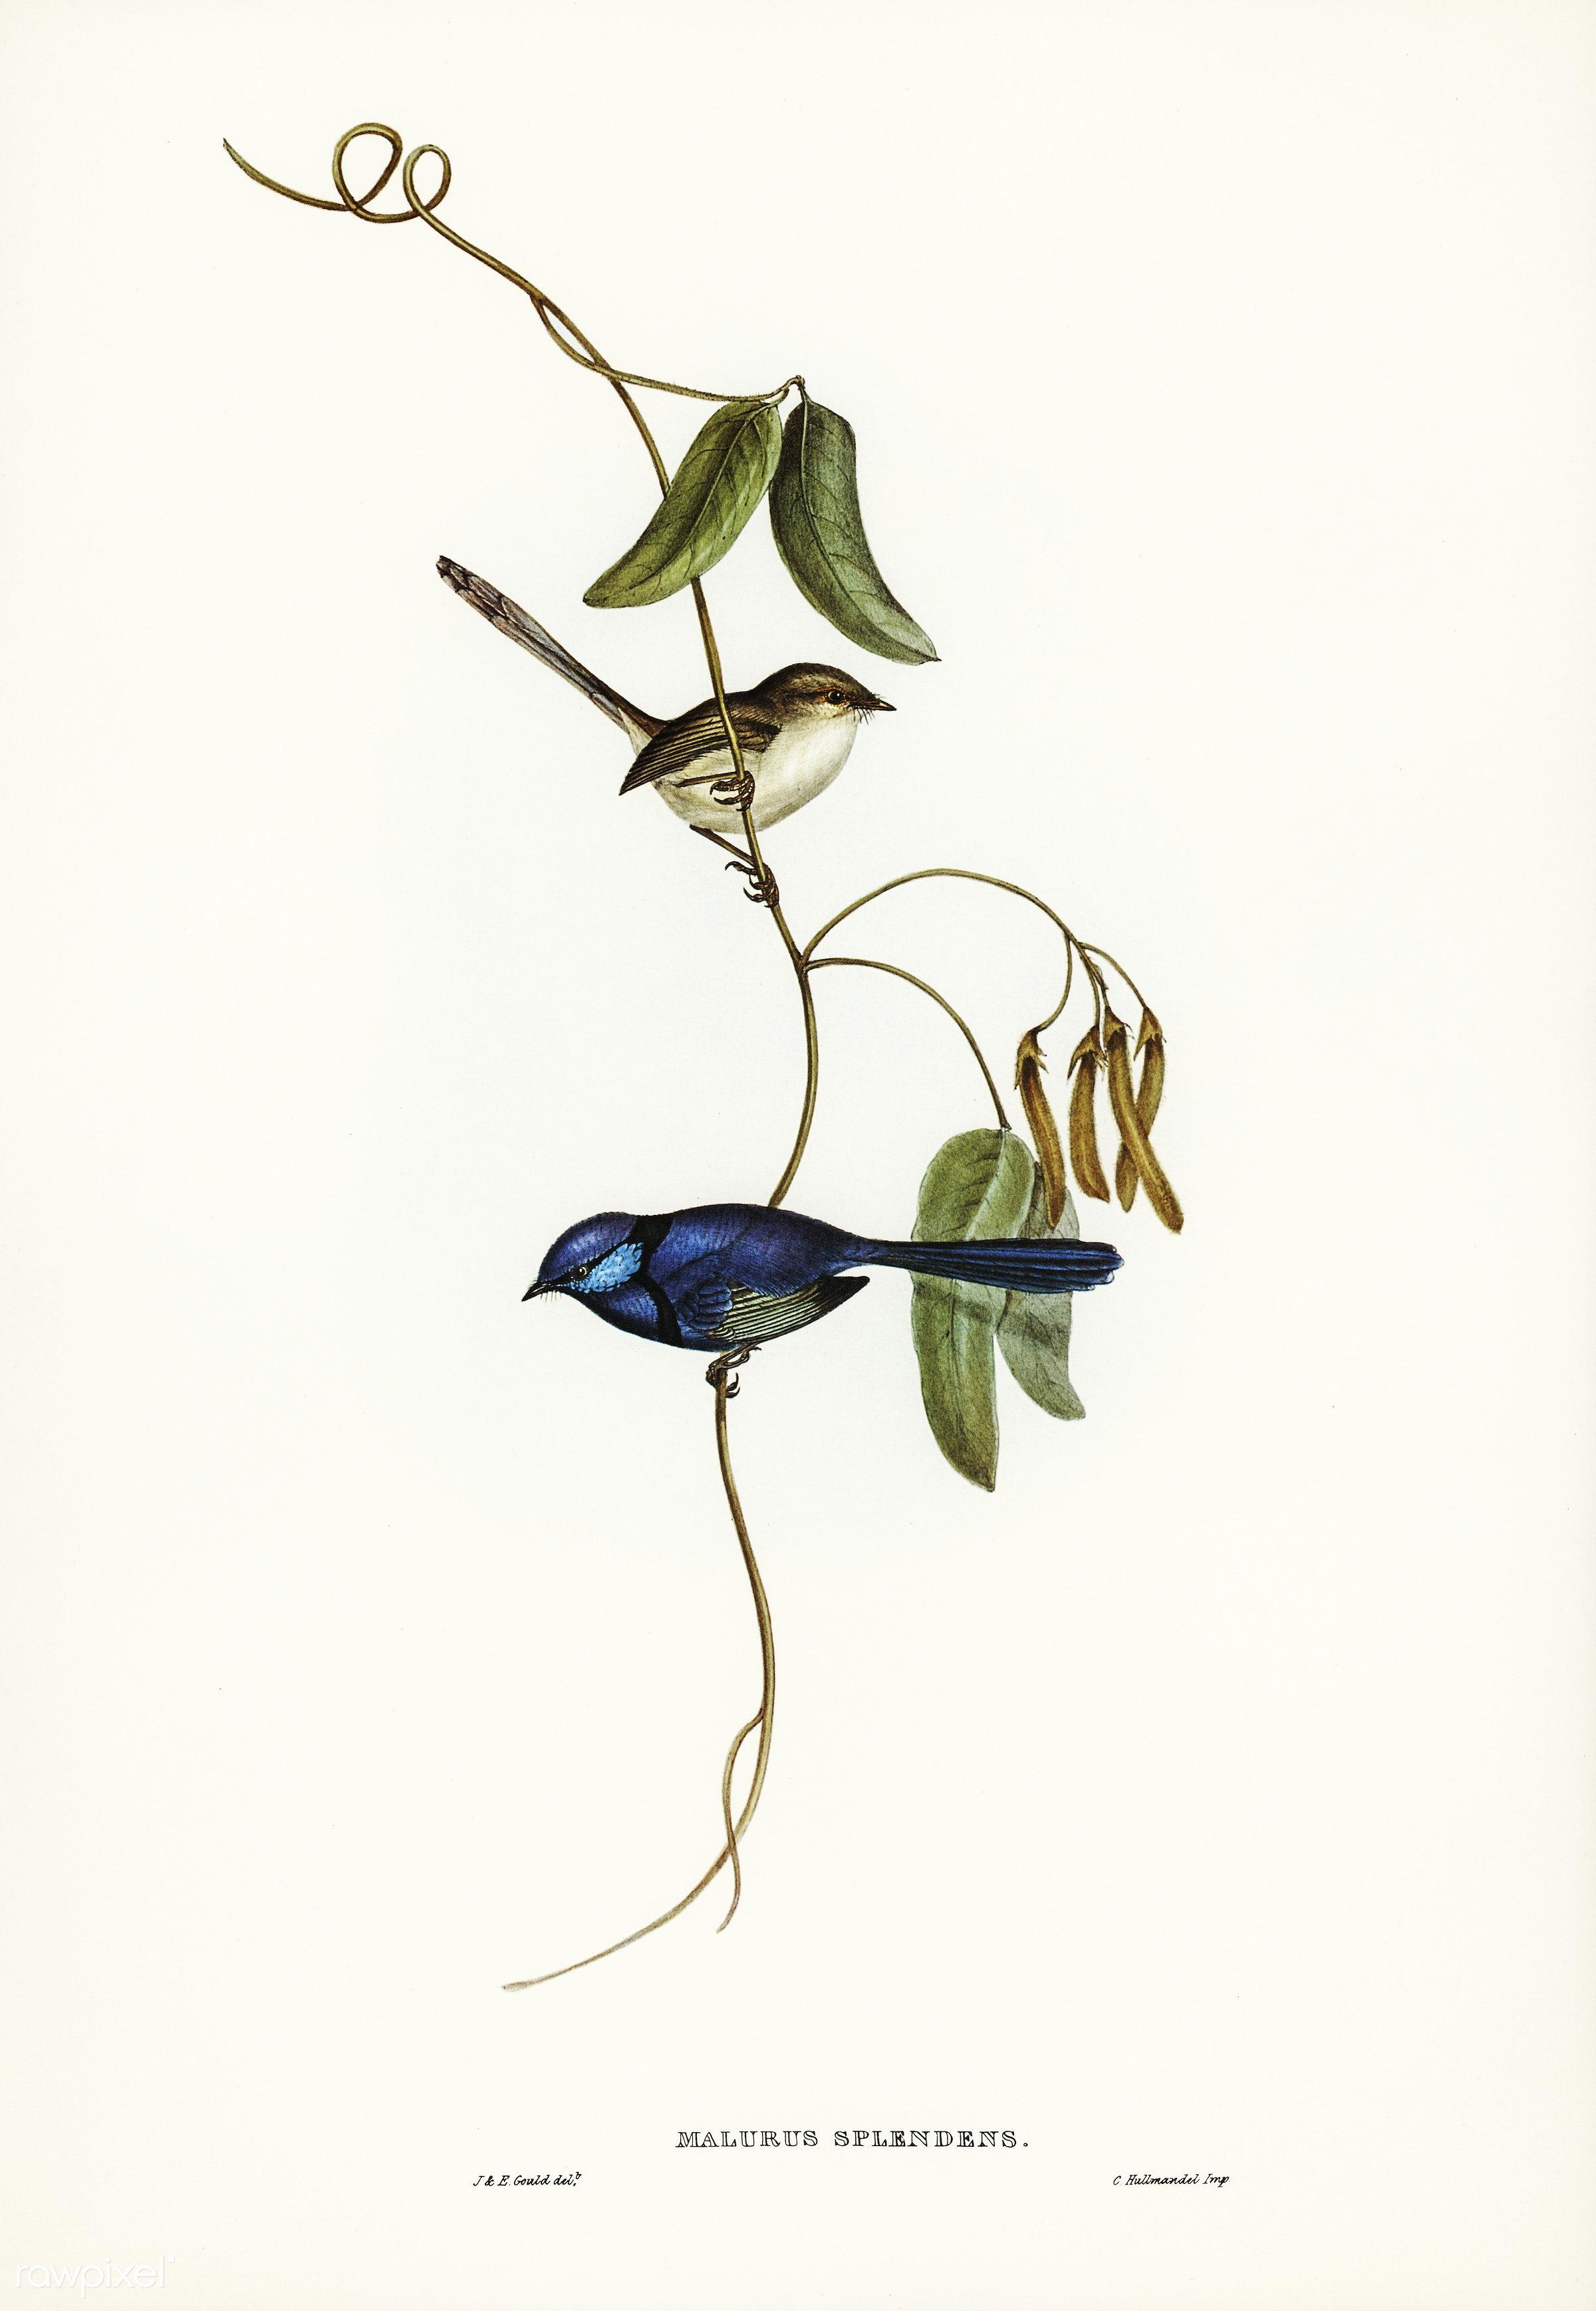 Banded Wren (Alurus splendens) illustrated by Elizabeth Gould (1804–1841) for John Gould's (1804-1881) Birds of...